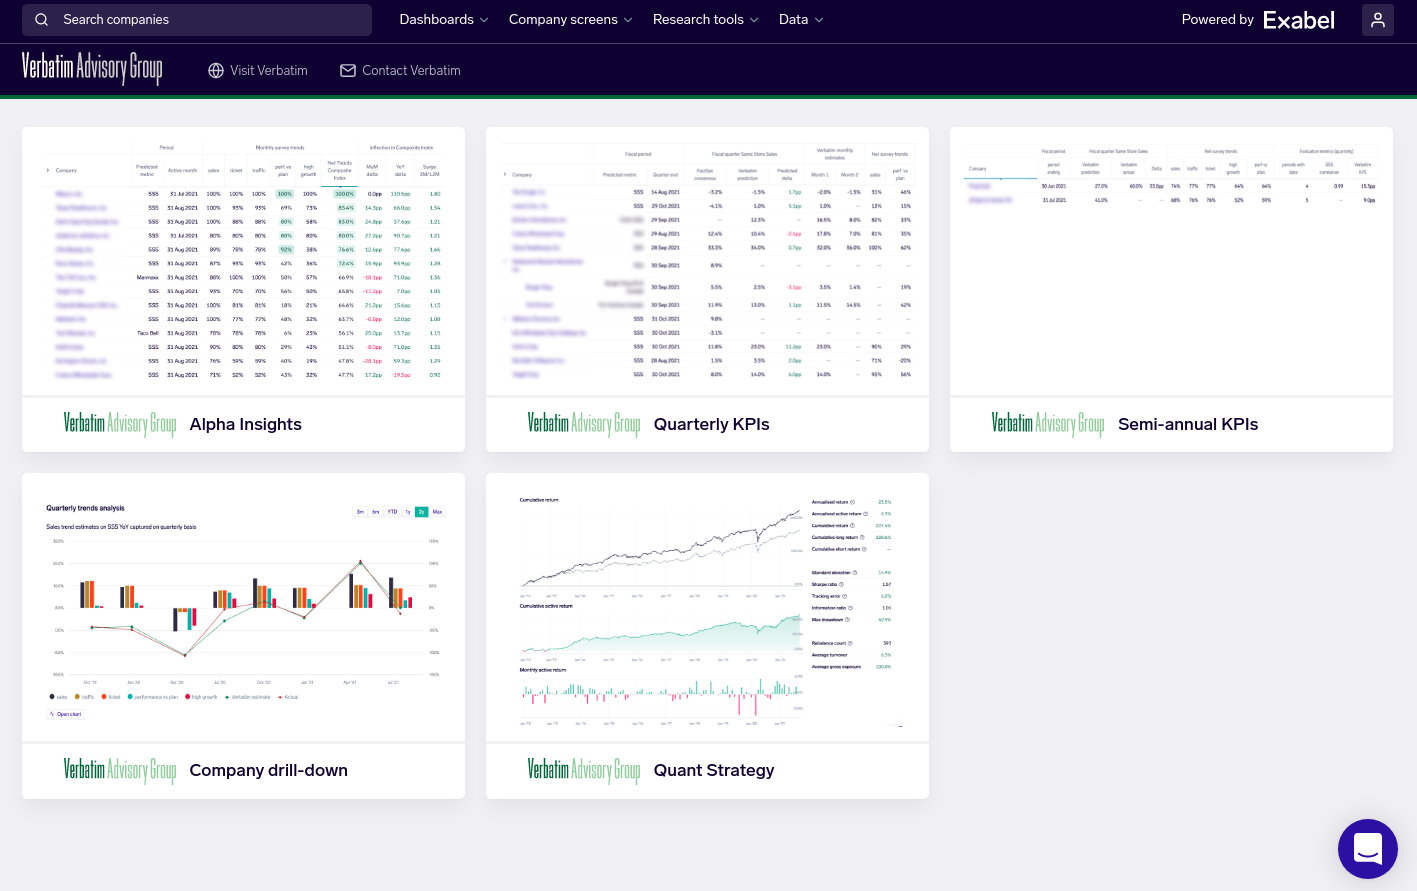 Exabel and Verbatim launch powerful new alternative data insights platform